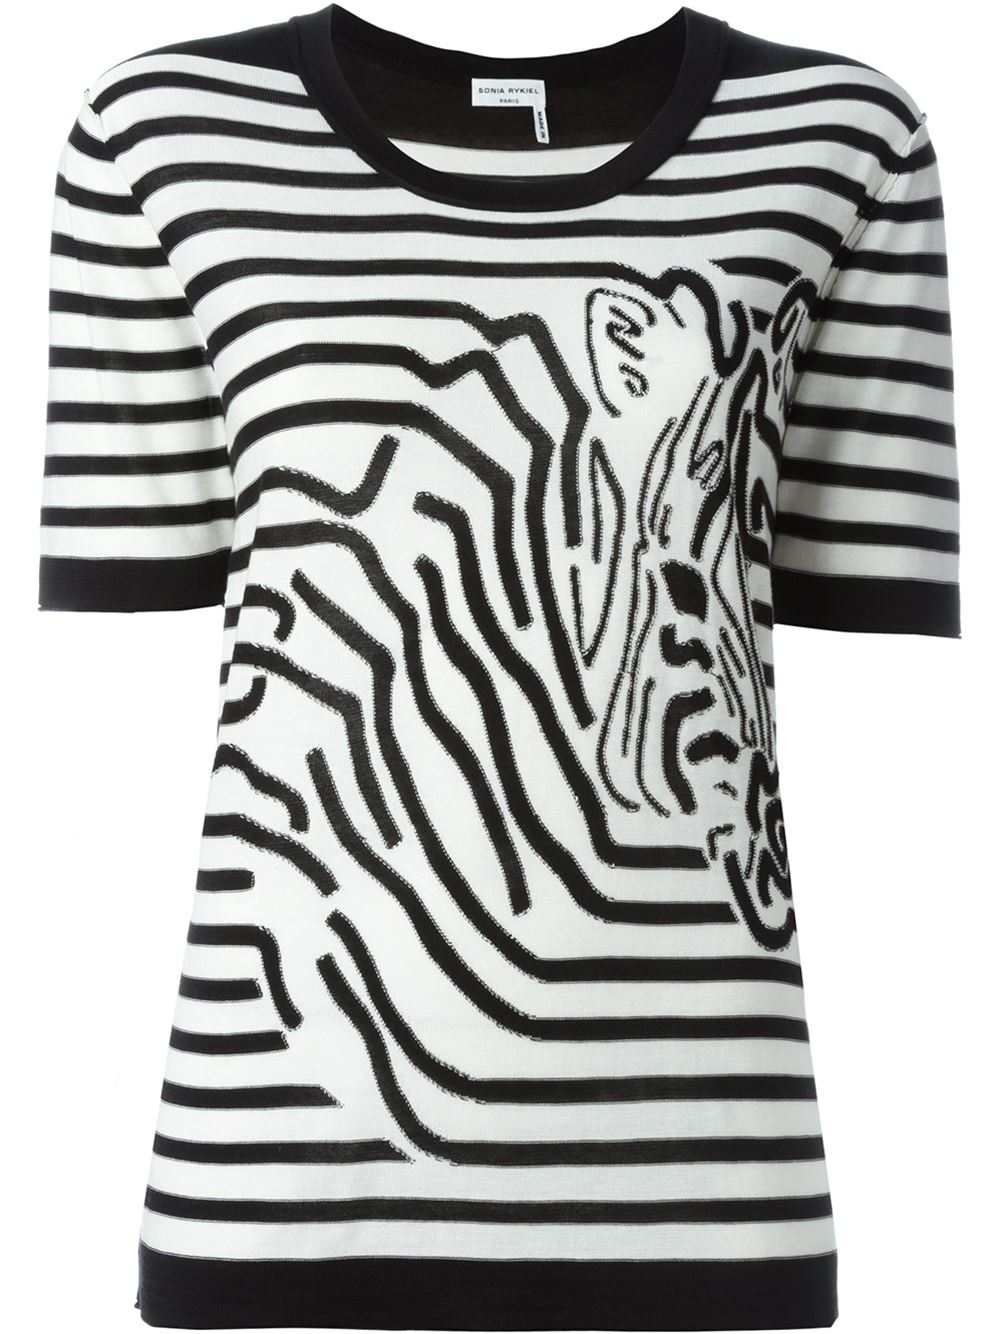 Zebra T Shirt Lyst - Sonia Ry...